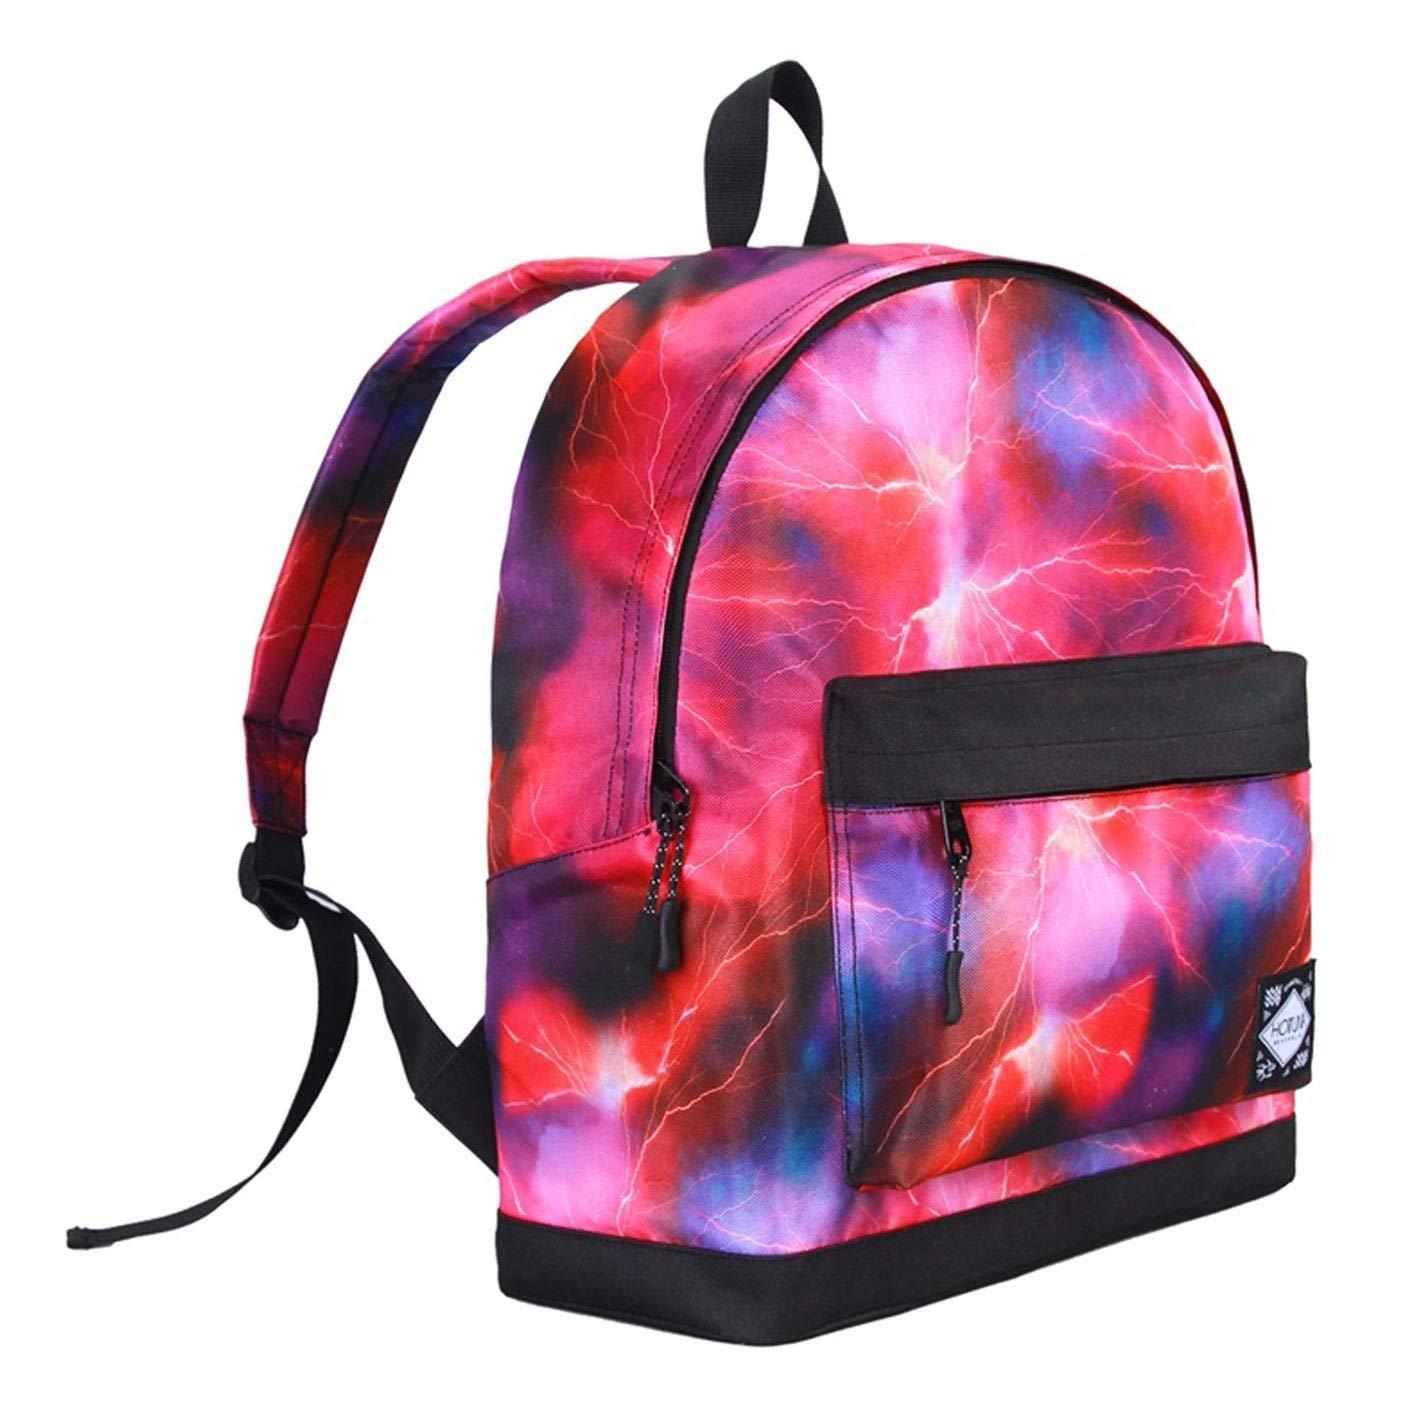 Galaxy  Pink Hot Tuna Galaxy Backpacks Rucksack Backpack Bag Daypack H 40 x W 28 x D 12 (cm) Galaxy  orange